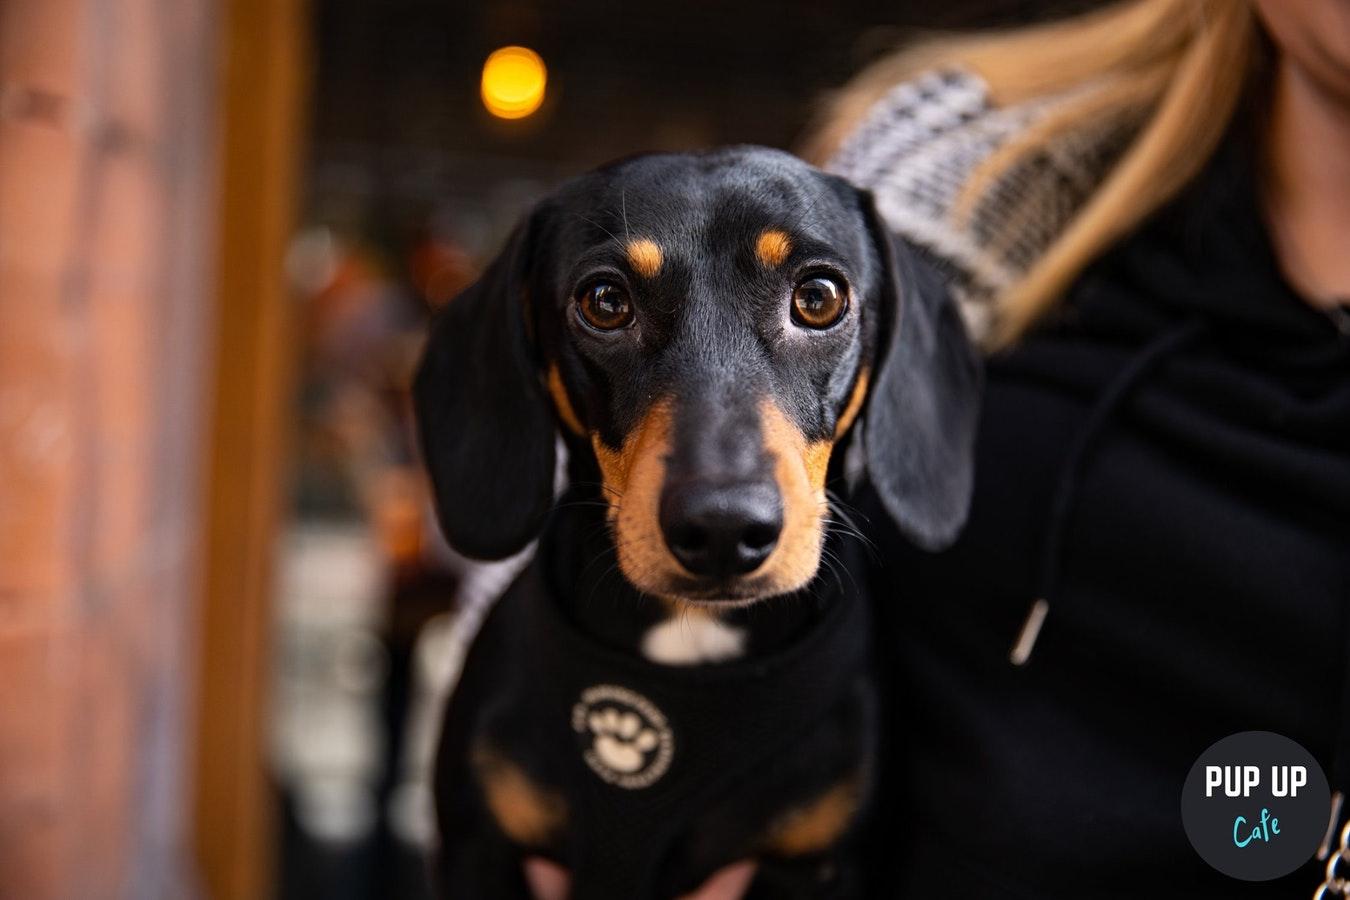 Dachshund Pup Up Cafe – Birmingham